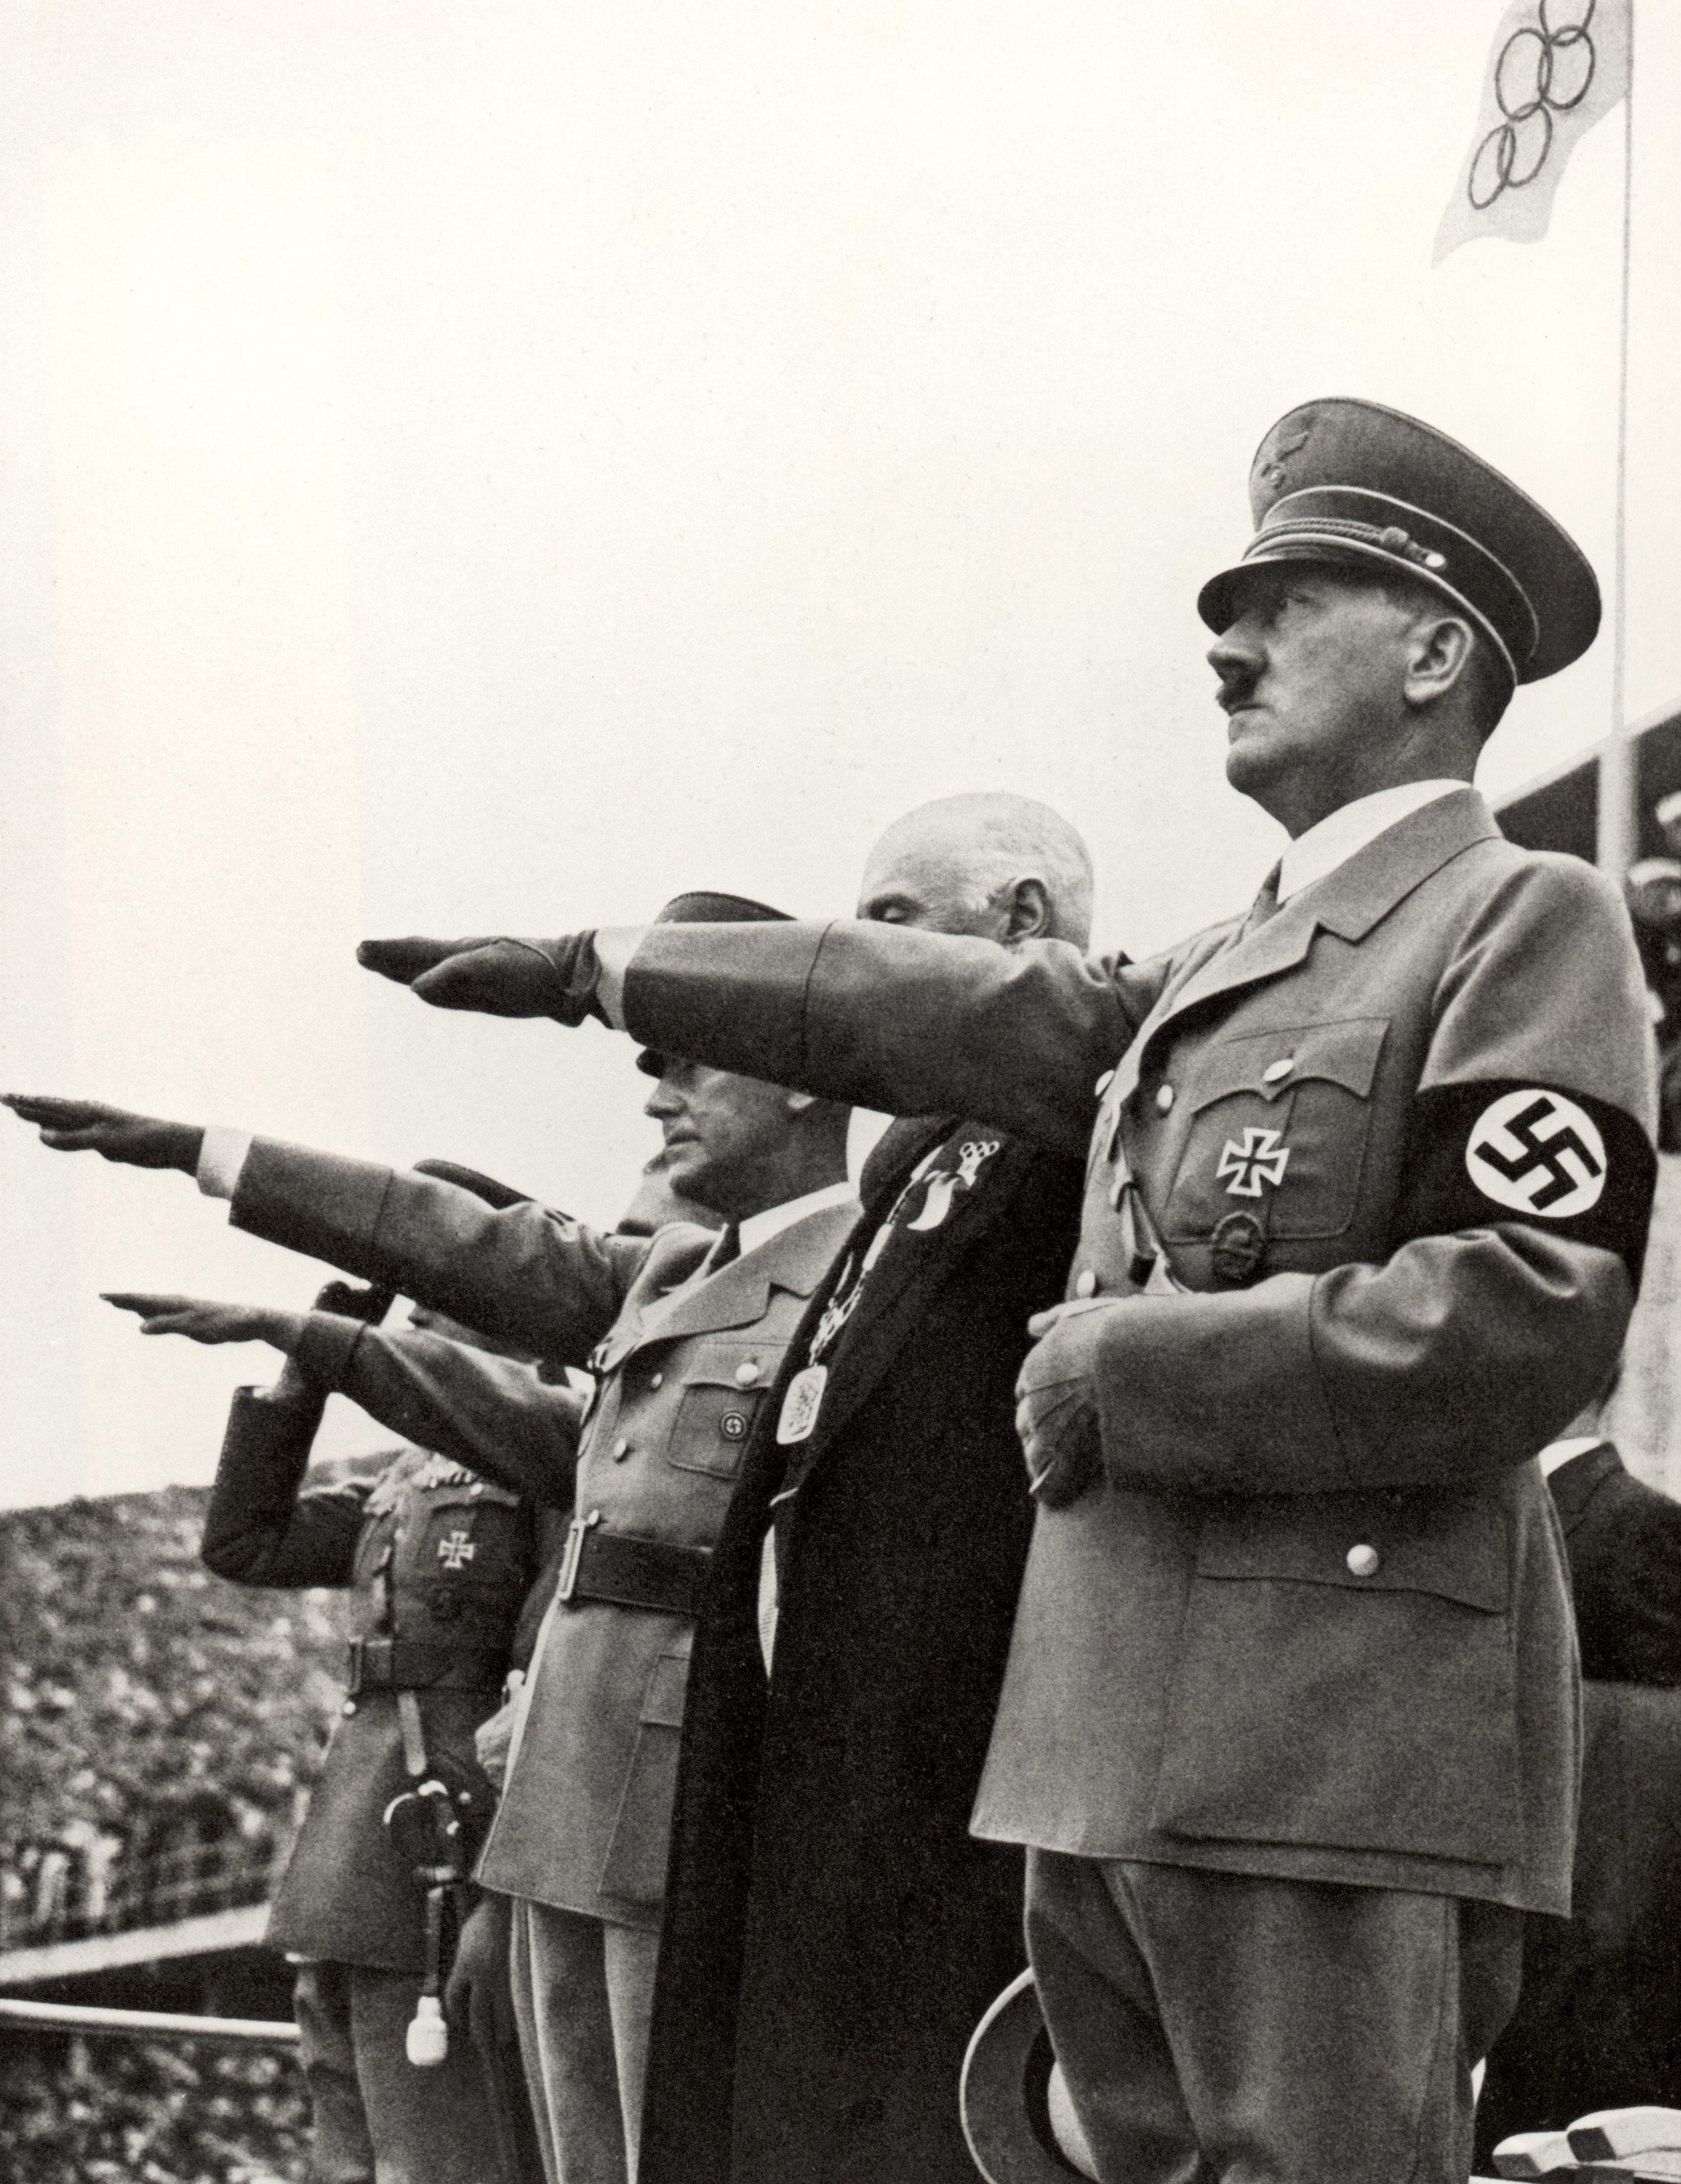 adolf hitler en las olimp iacute adas de berl iacute n 1936 the adolf hitler en las olimpiacuteadas de berliacuten